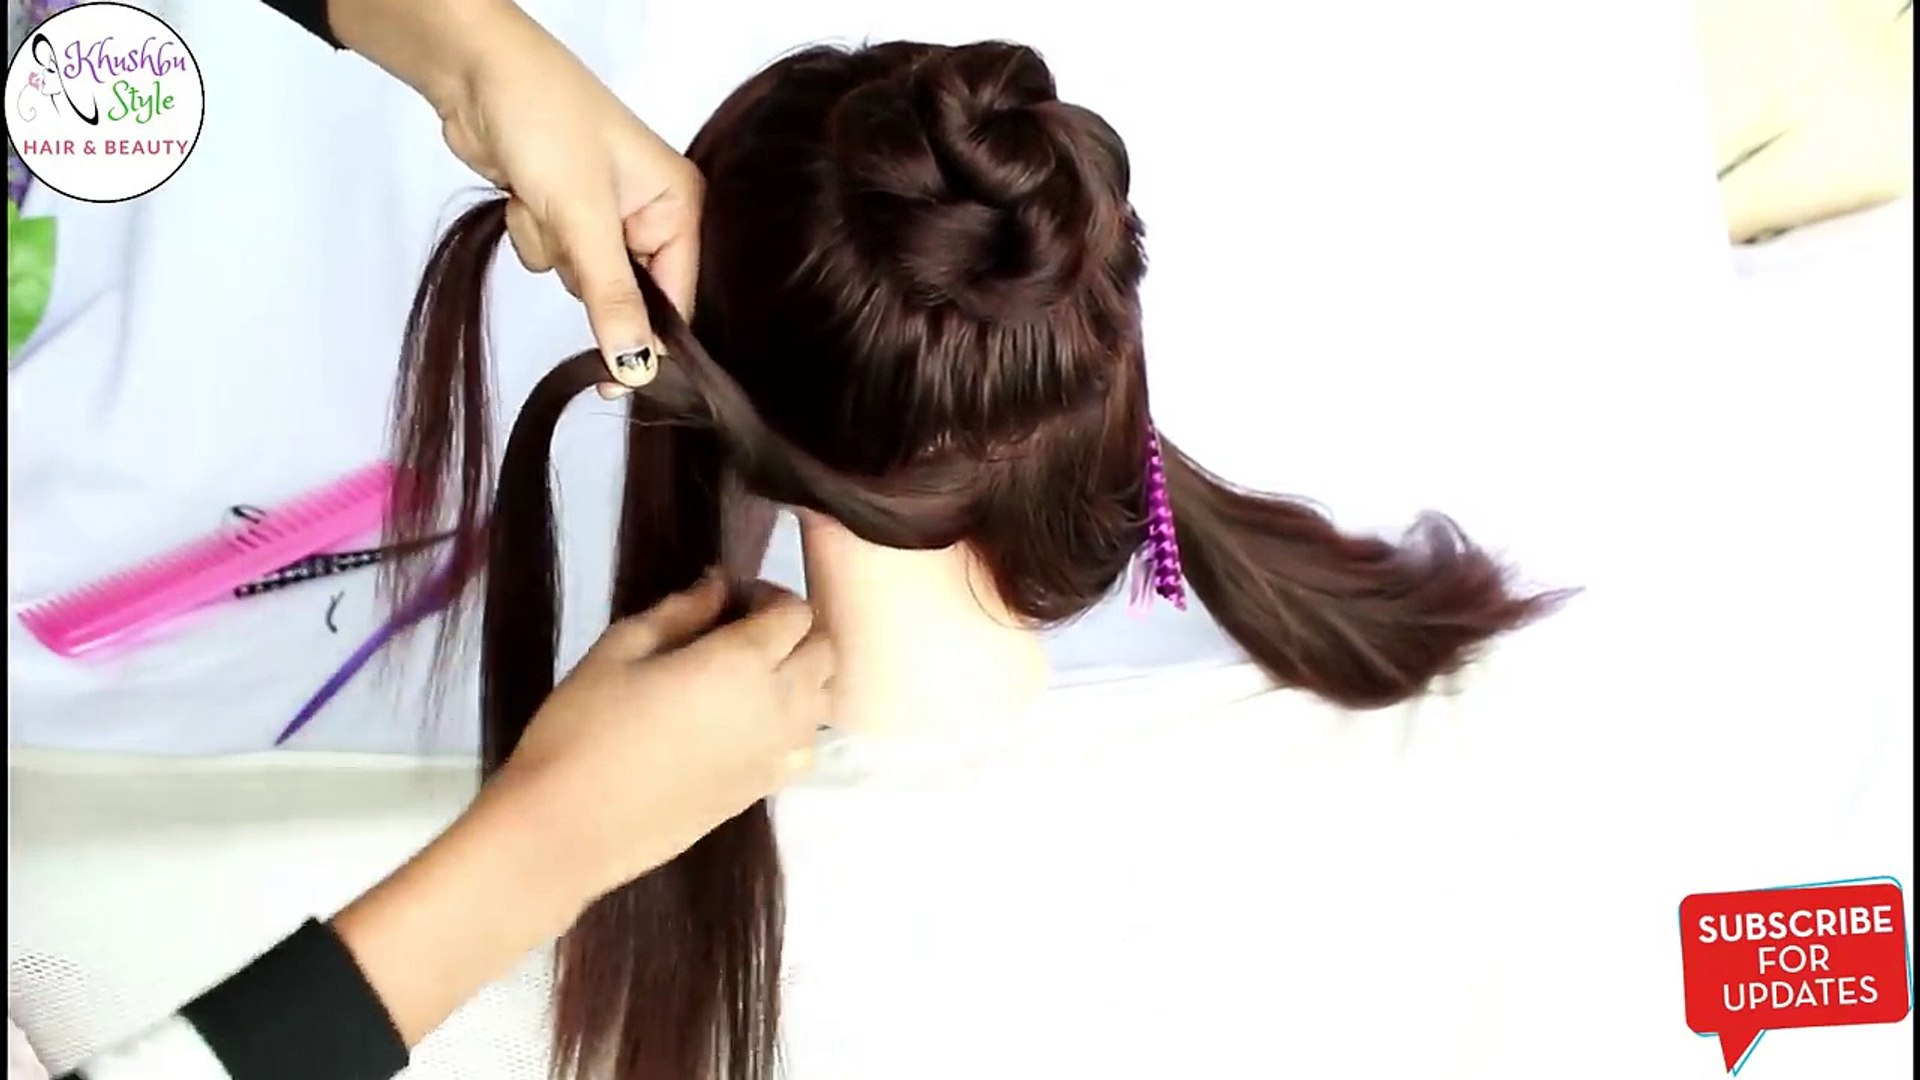 hairstyles 2018 -- hair design -- hair style girl -- cute hairstyles -- natural hair styles